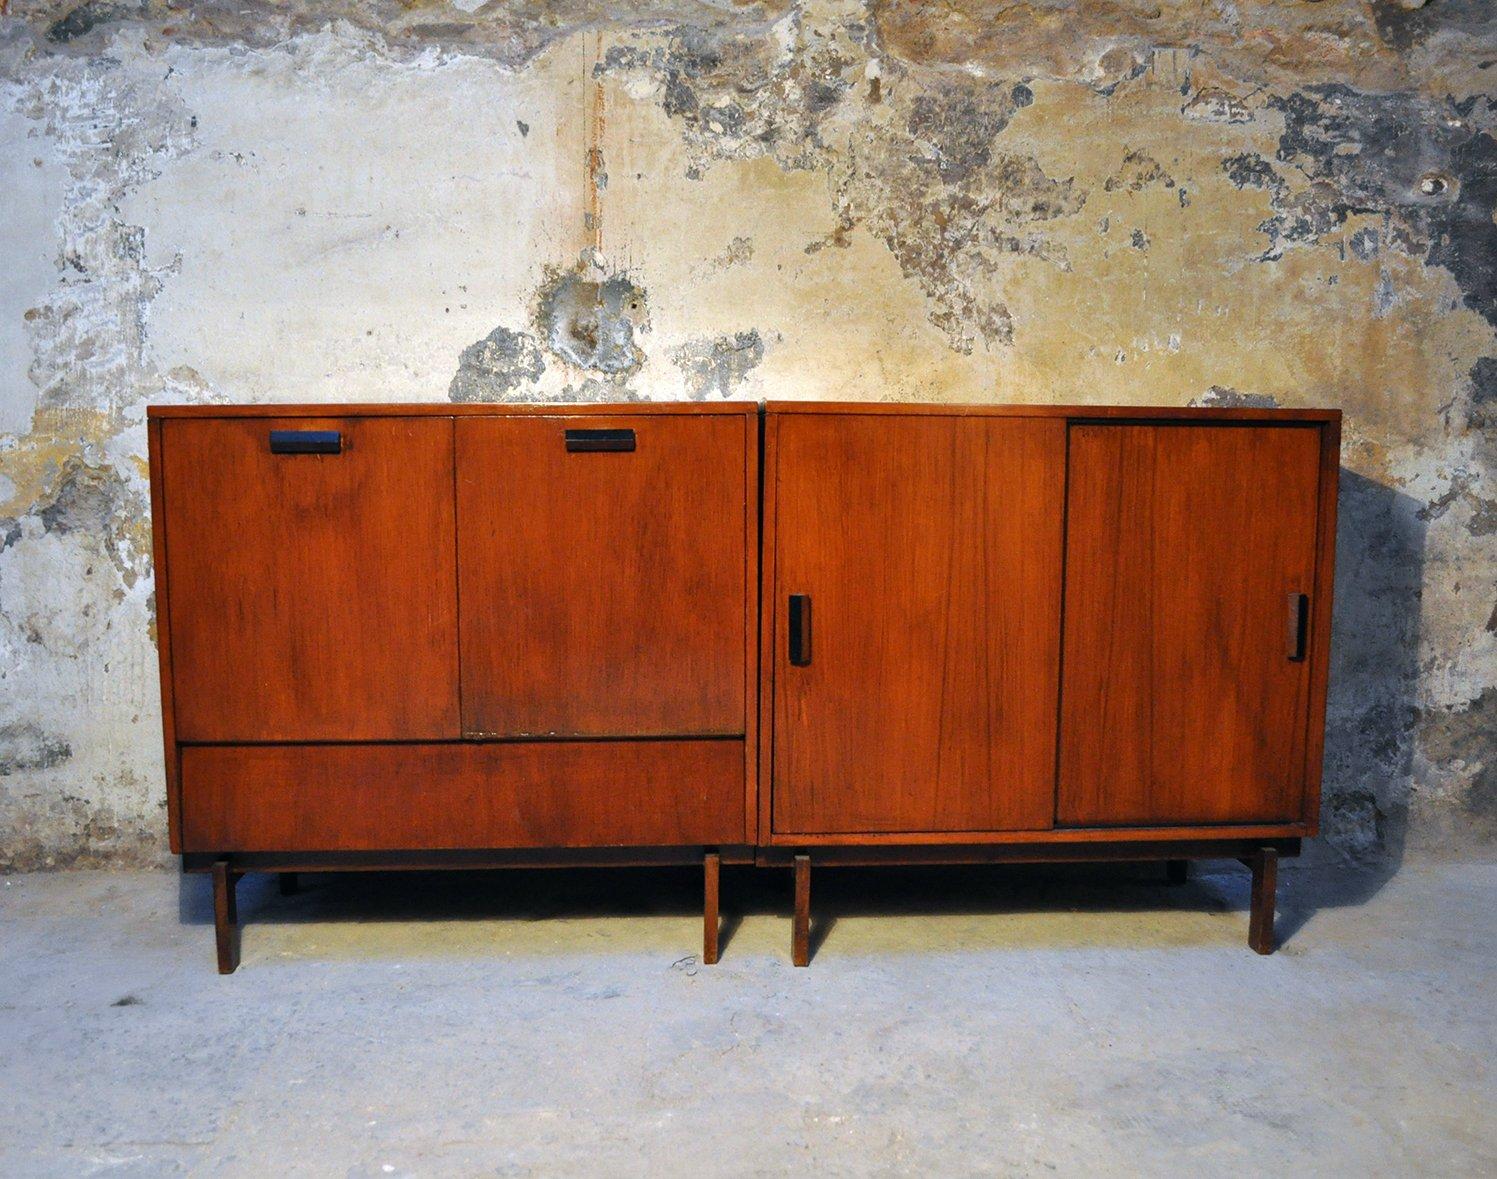 Mobile Bar & Schrank von Leonardo Fiori für ISA Bergamo, 1950er